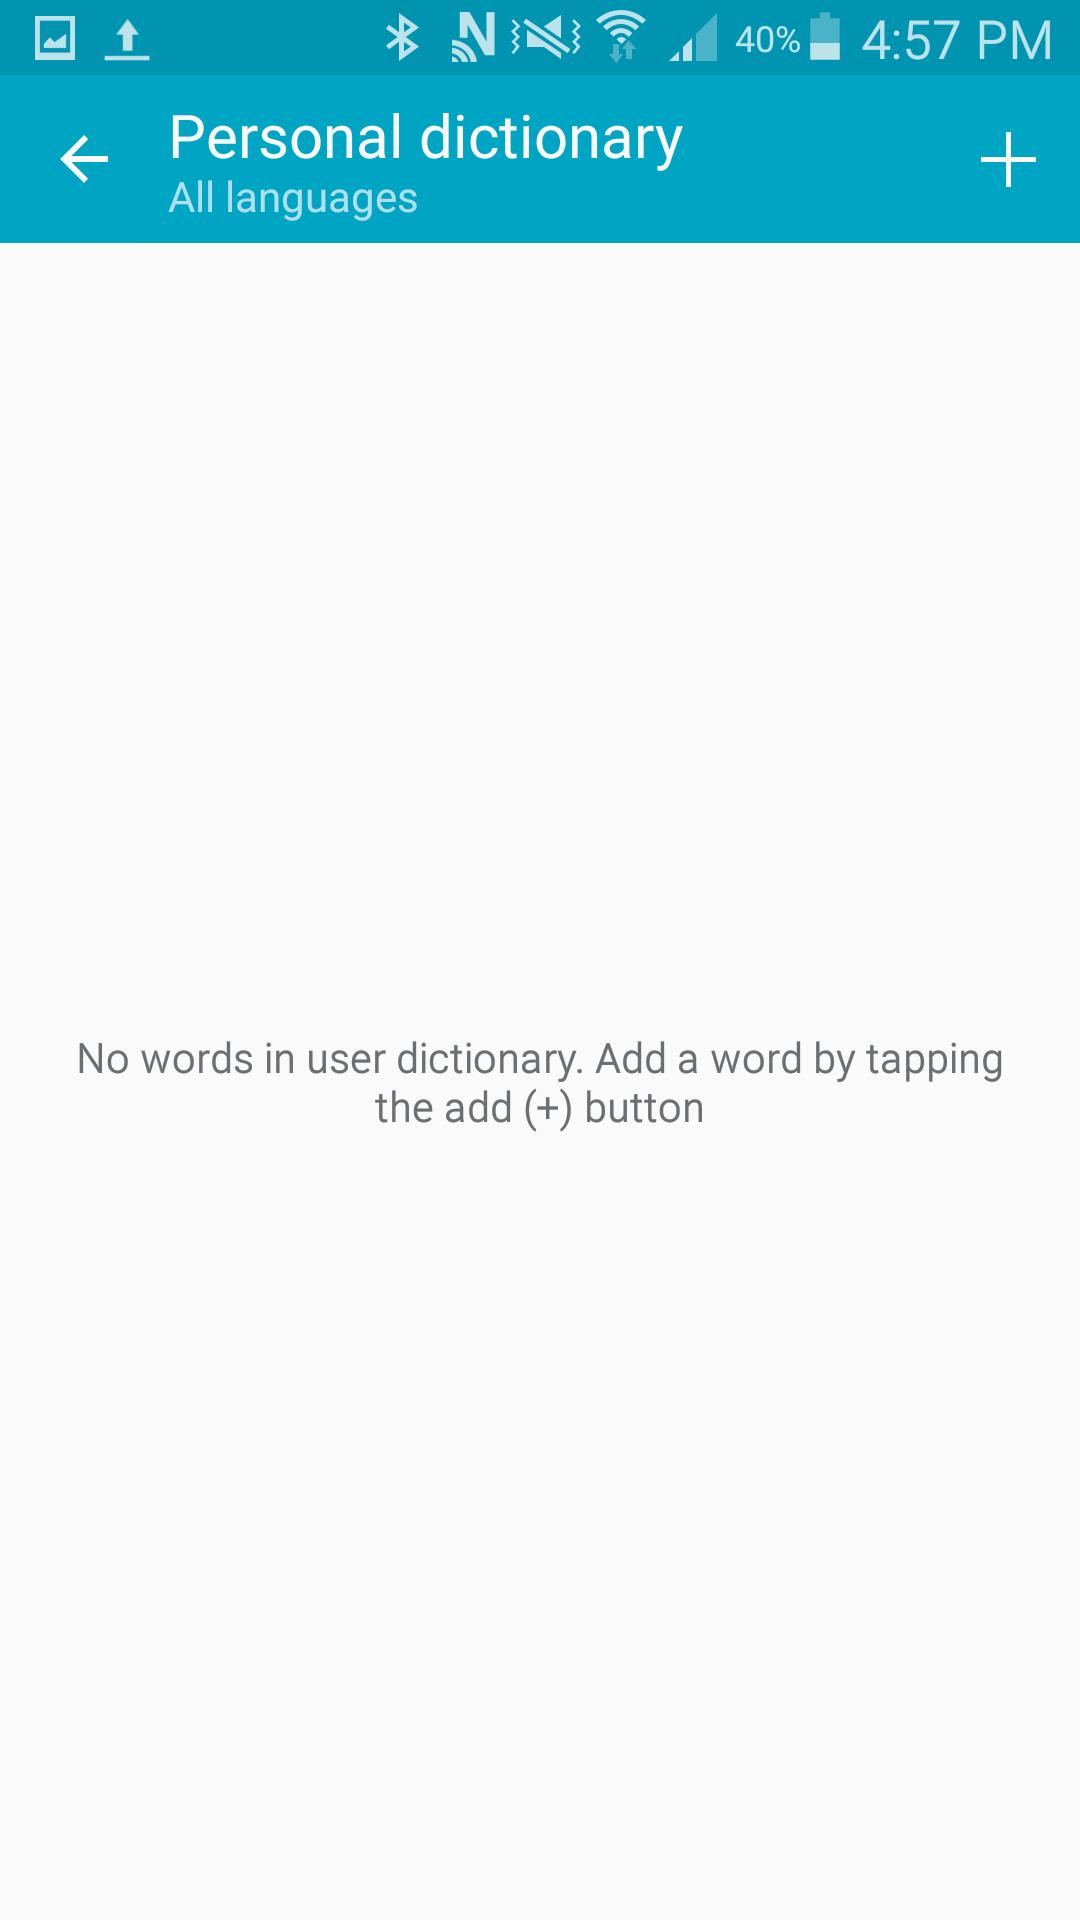 Add word to Gboard? - Google Search Help